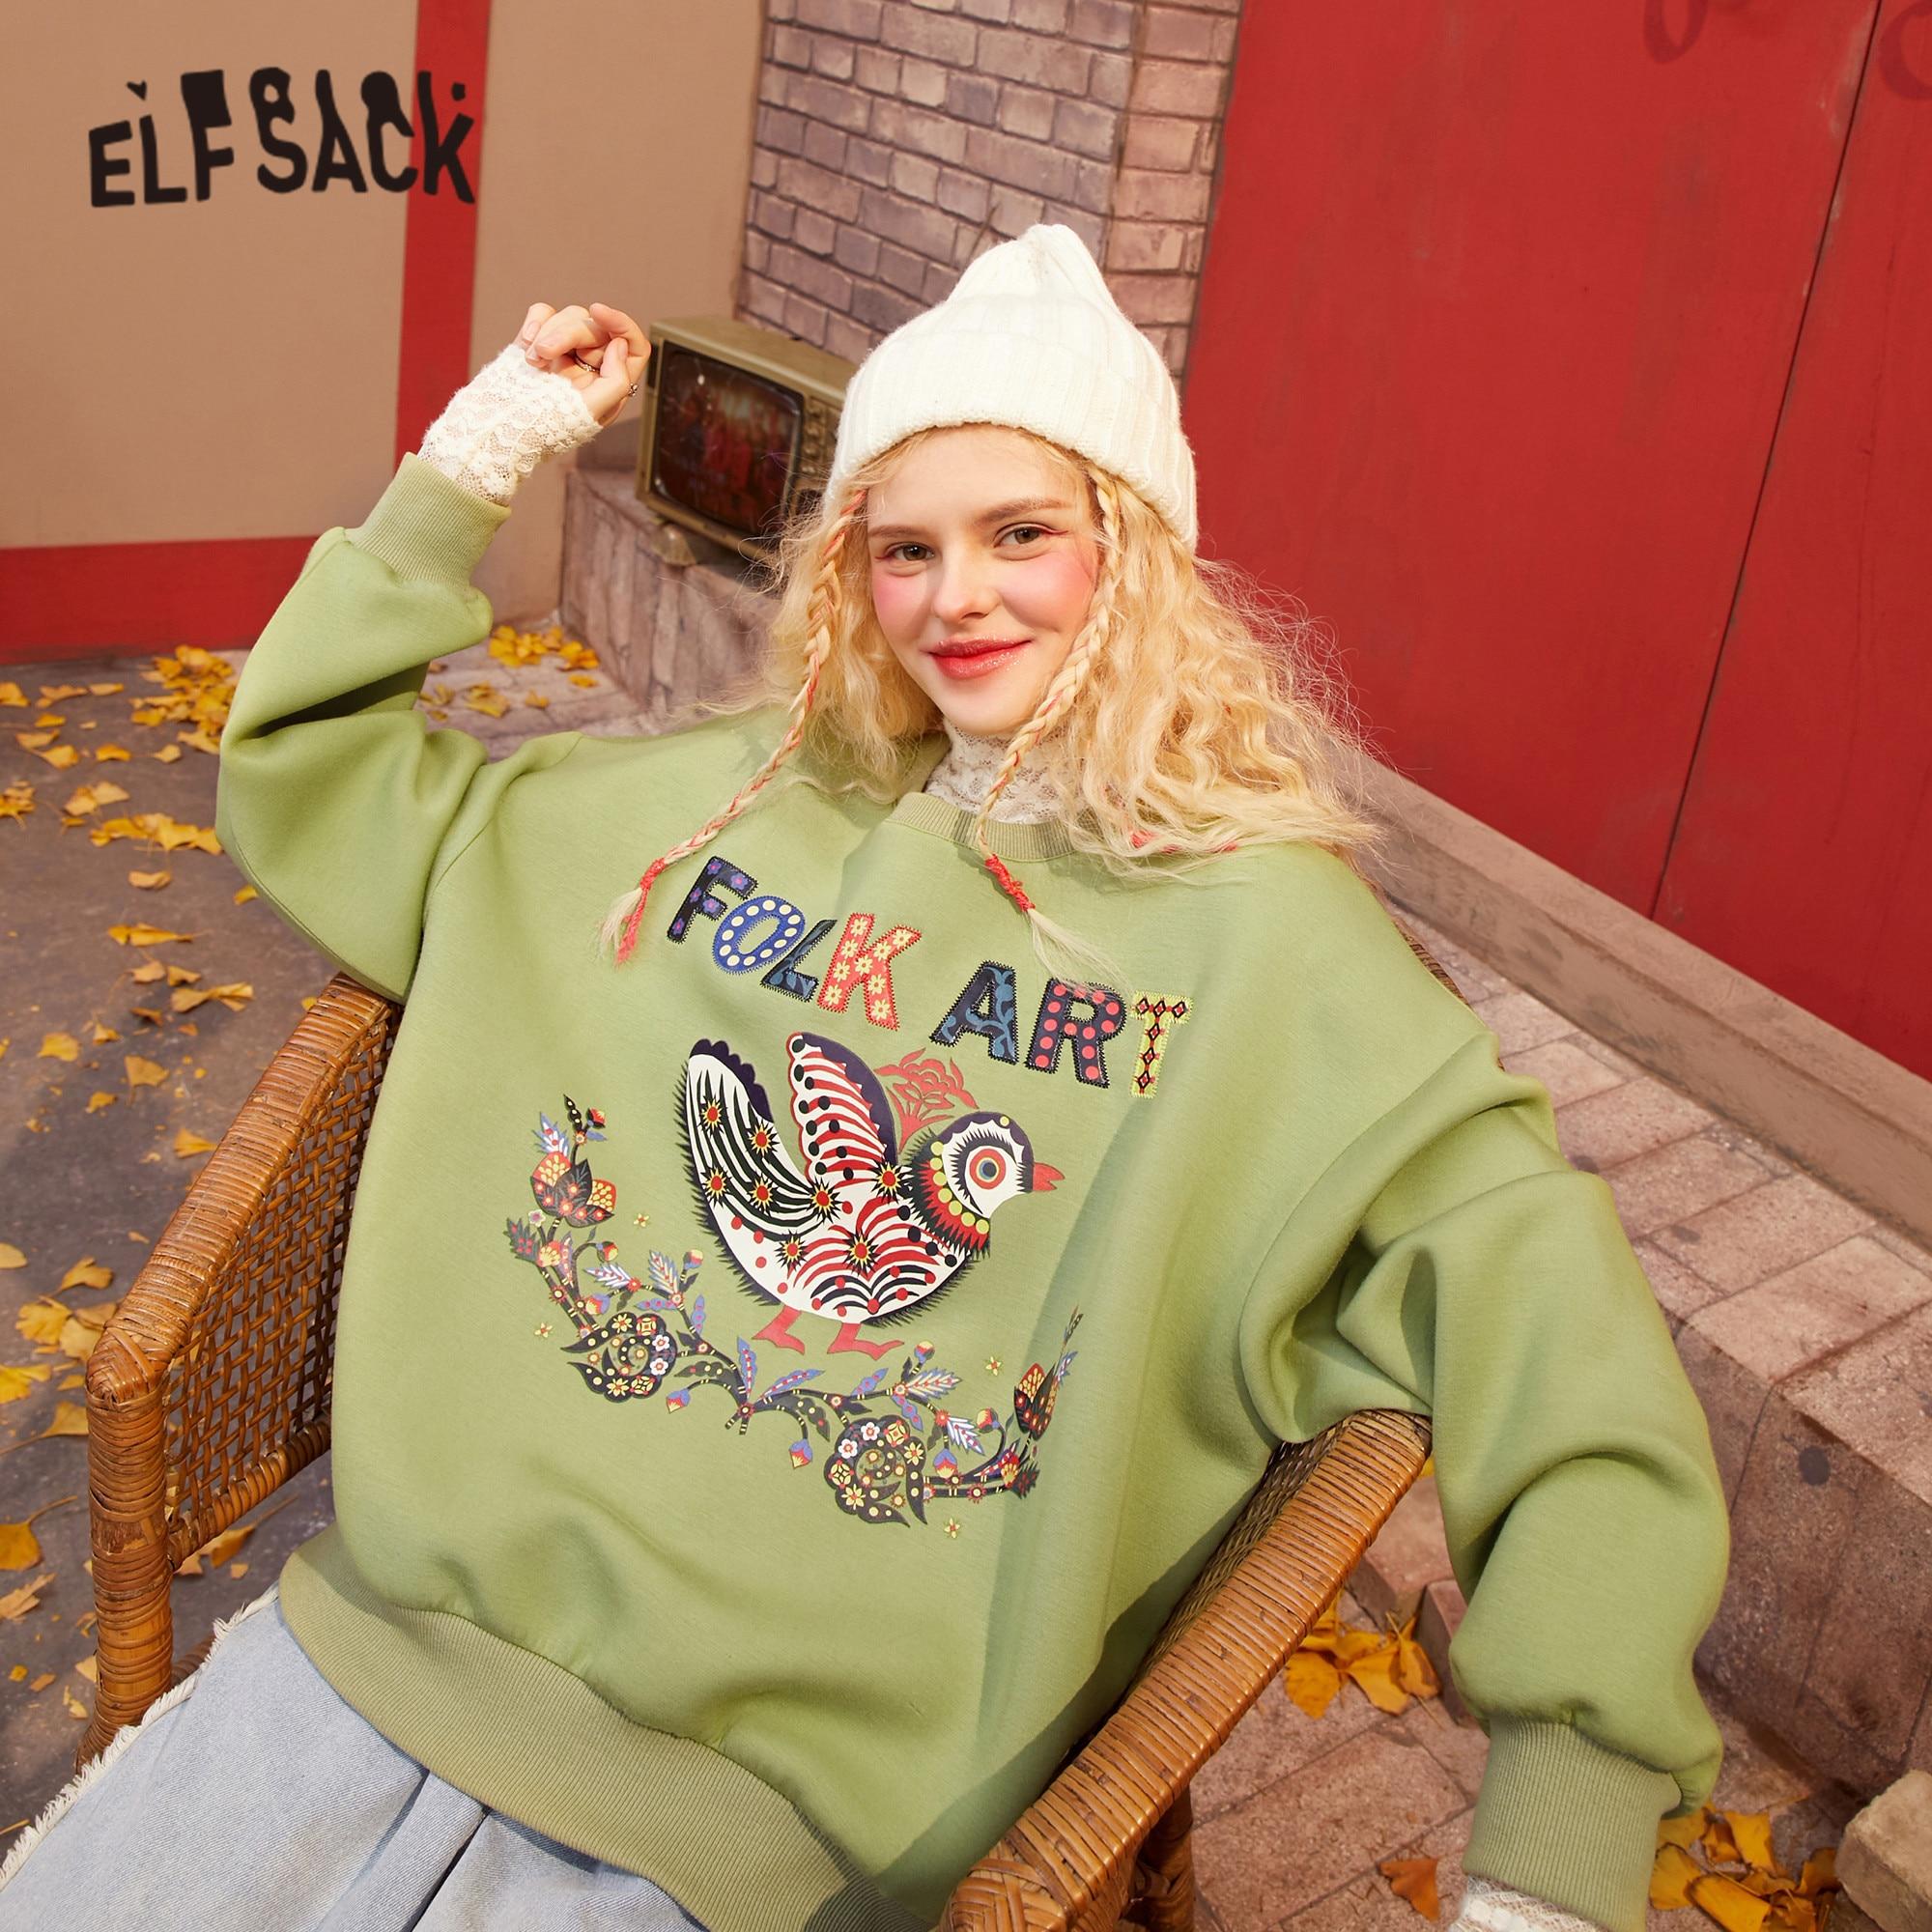 elfsack harajuku impressao grafica casual pulover moletom feminino 2021 primavera